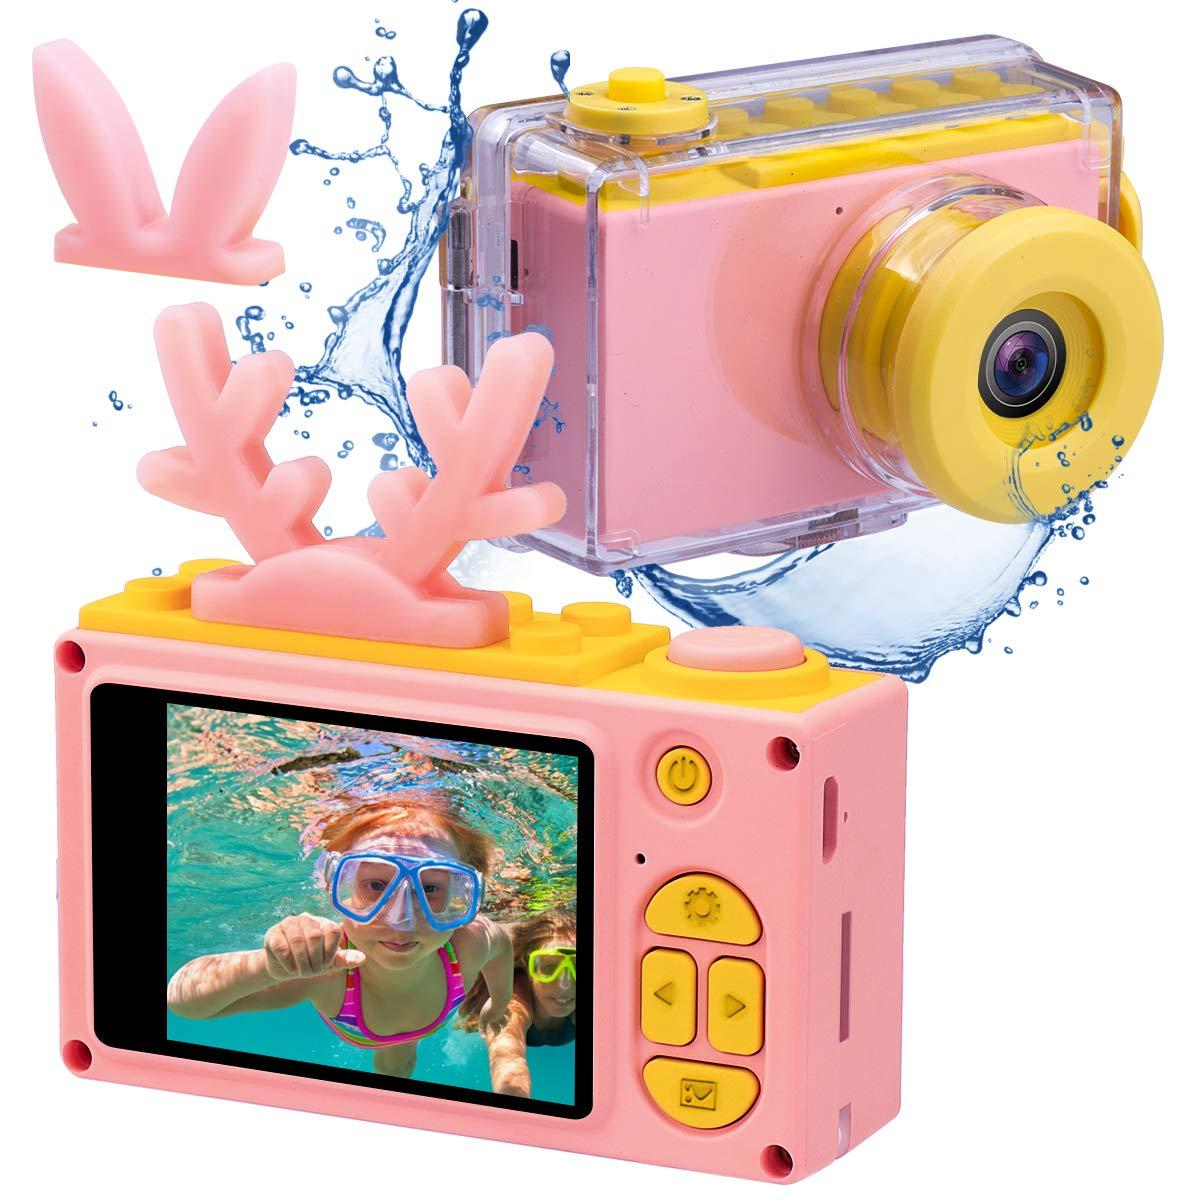 Kids Digital Cameras for Boys HD 1080P Video Camera for Kids Children Selfie Camera Kids Toy Cameras Mini Child Camcorder for Age 3-10 Boys/Girls Pink